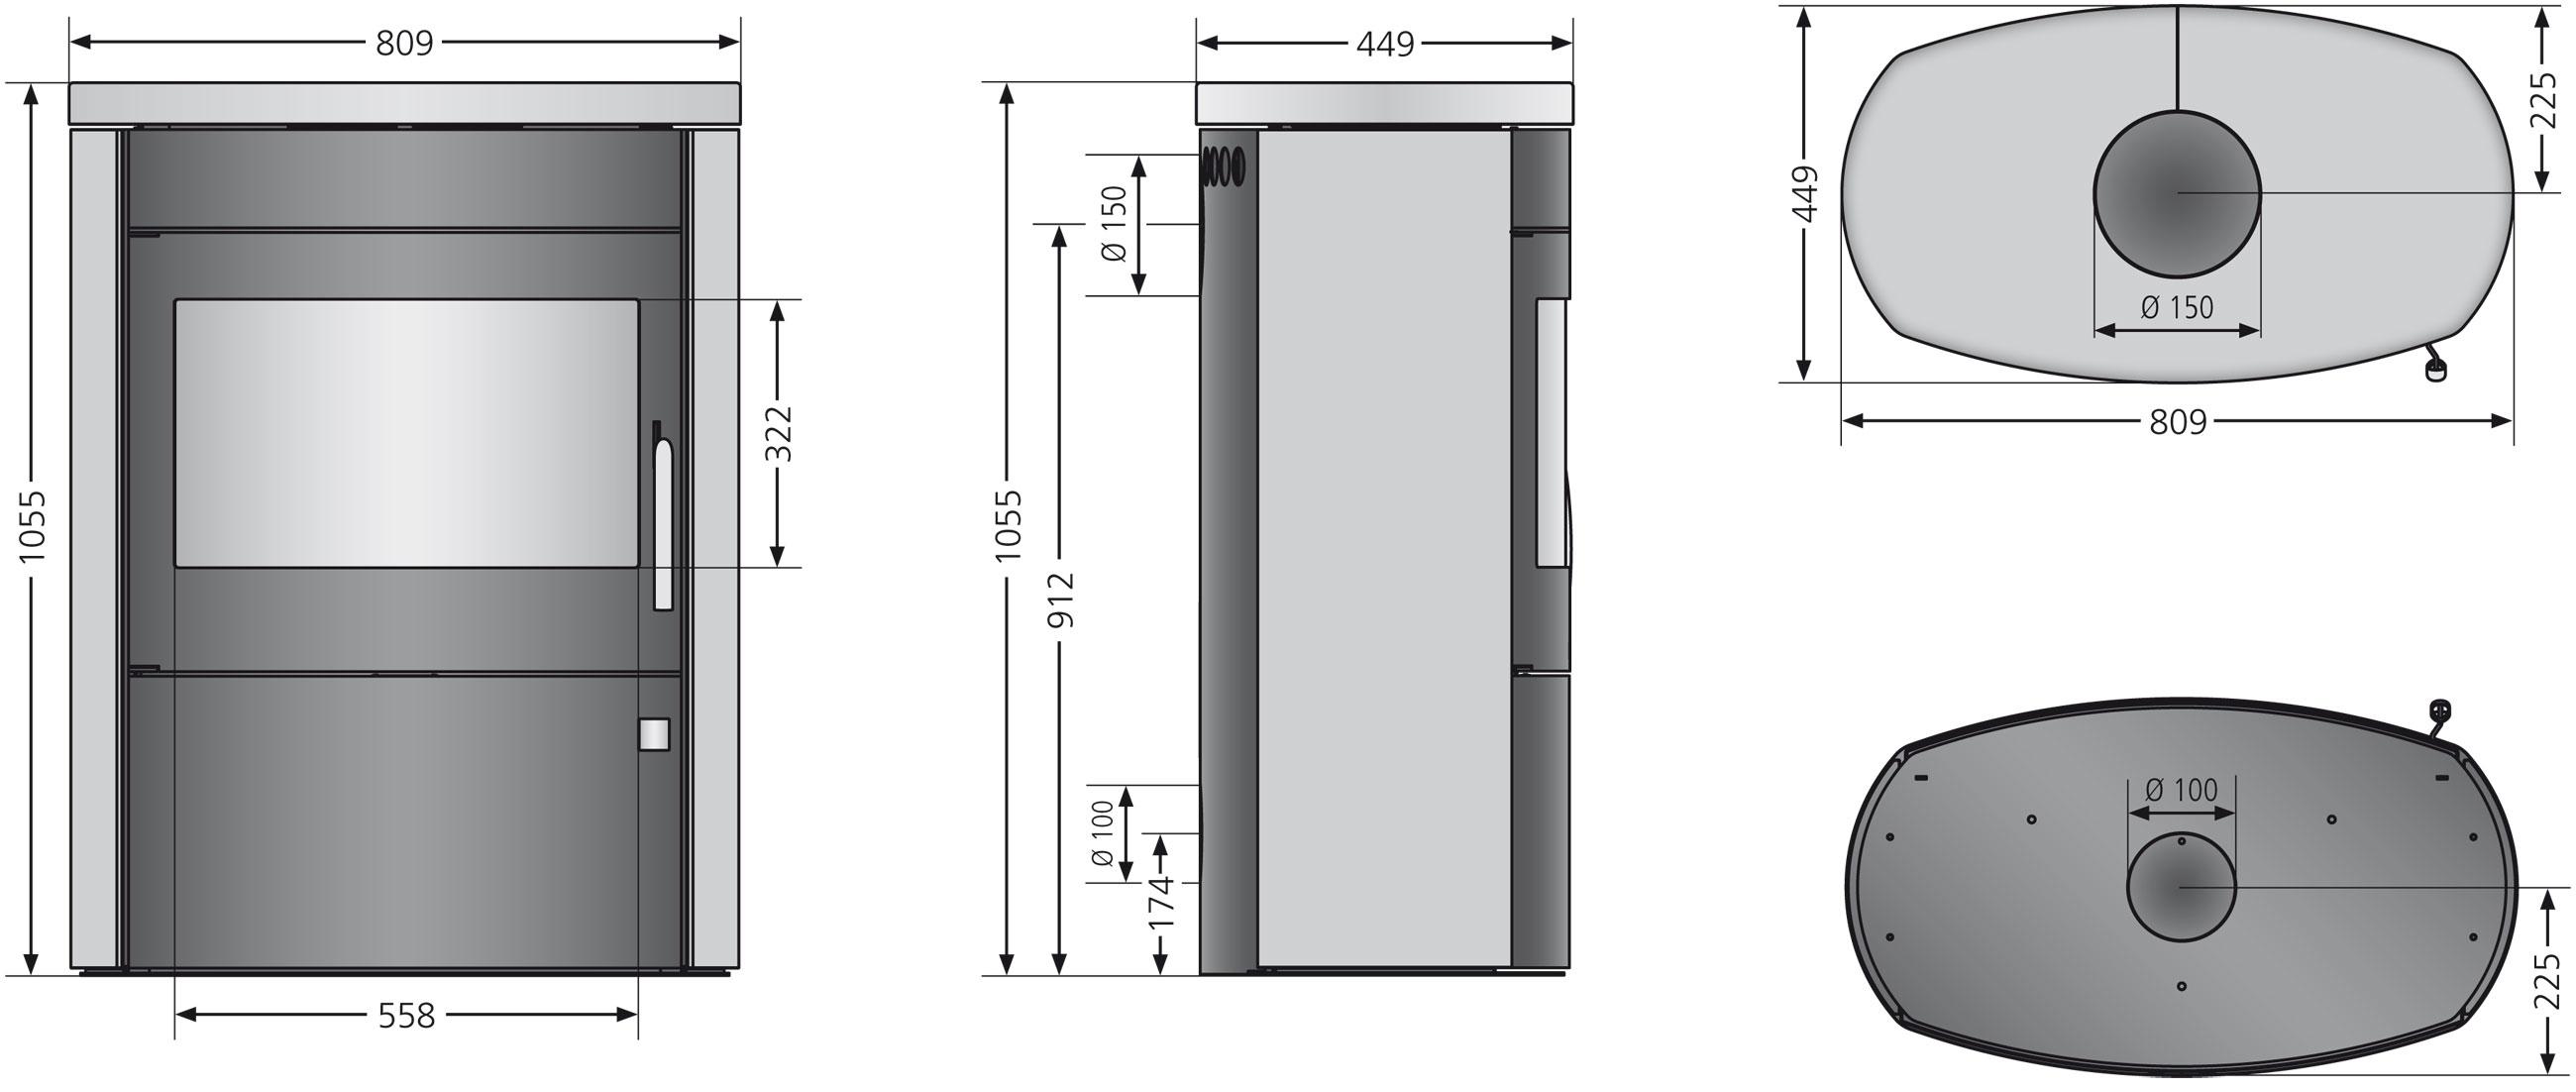 Kaminofen Justus Agero 2.0 raumluftunabhängig Stahl schwarz 7kW Bild 4